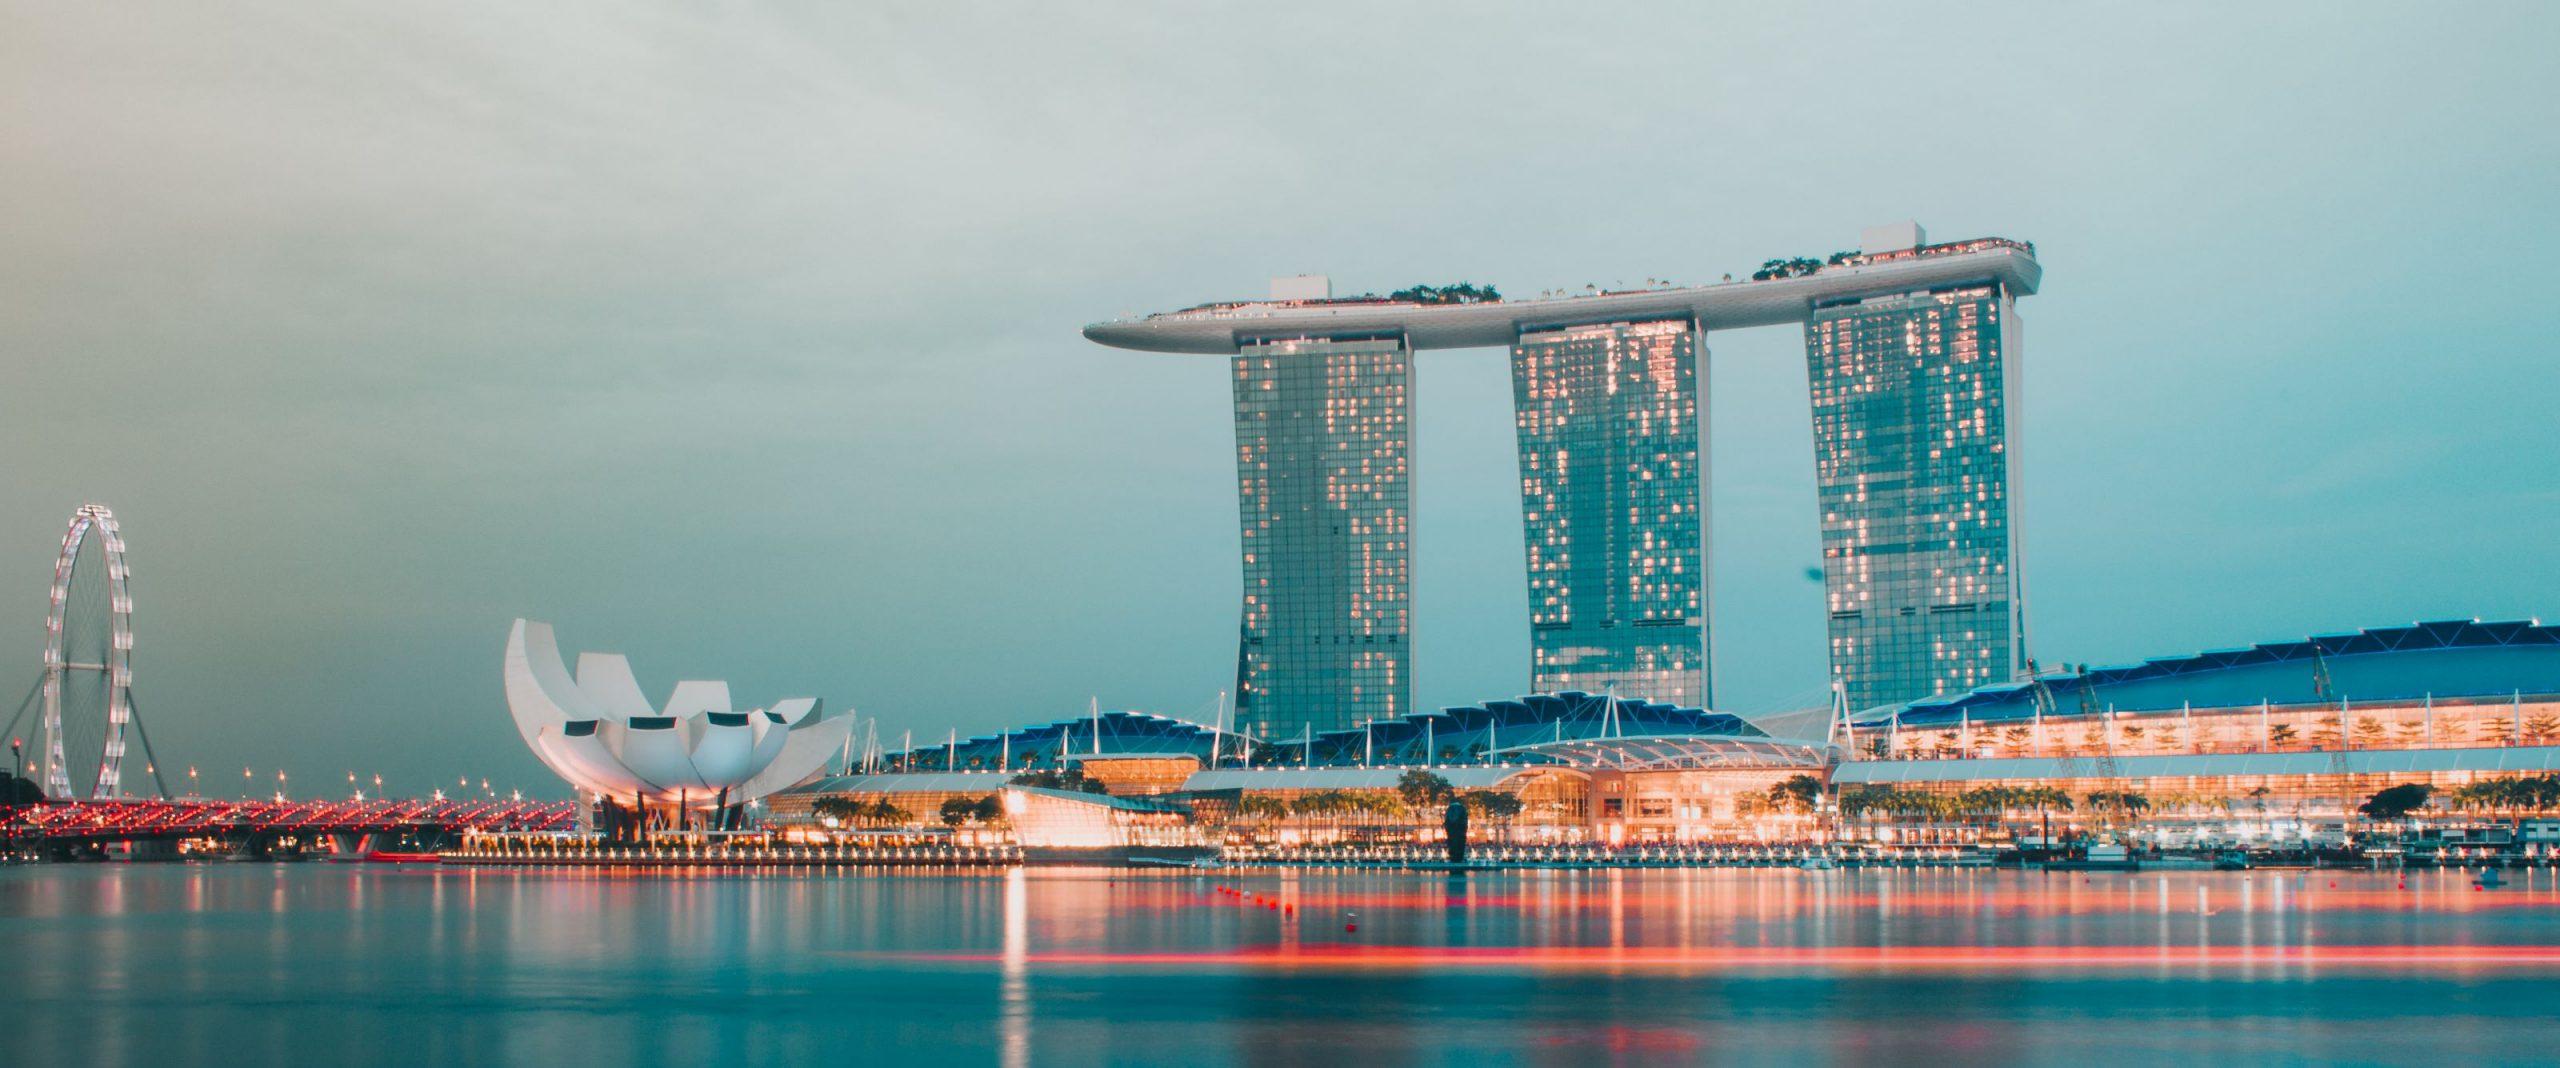 View of the Marina Bay and Marina Bay Sands Hotel lit up at dusk Singapore